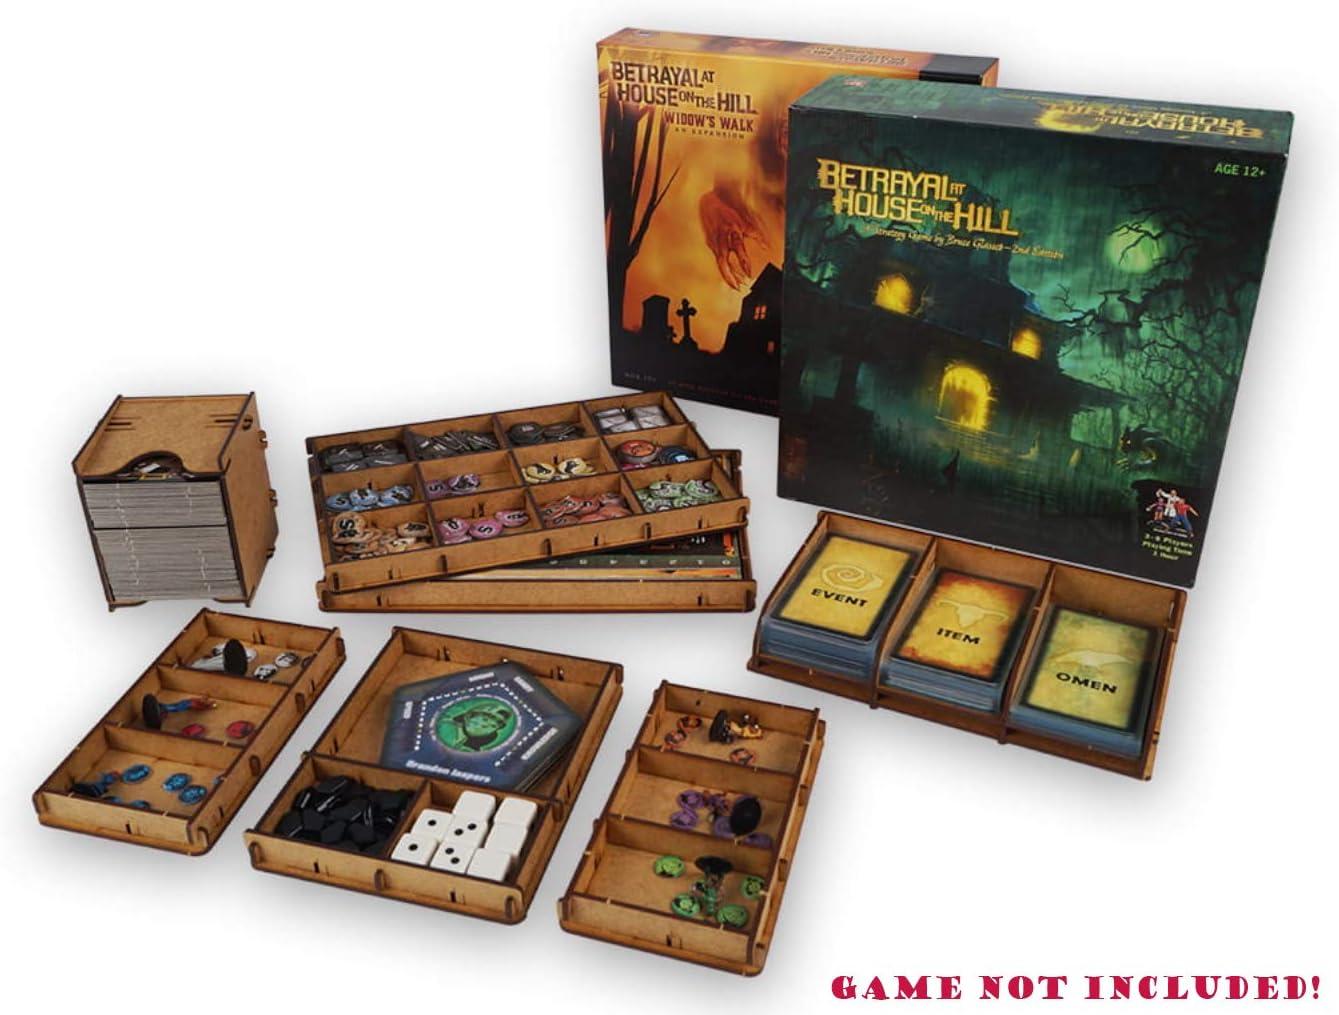 docsmagic.de Organizer Insert for Betrayal at House on The Hill 2nd + Widow Walk Box - Encarte: Amazon.es: Juguetes y juegos